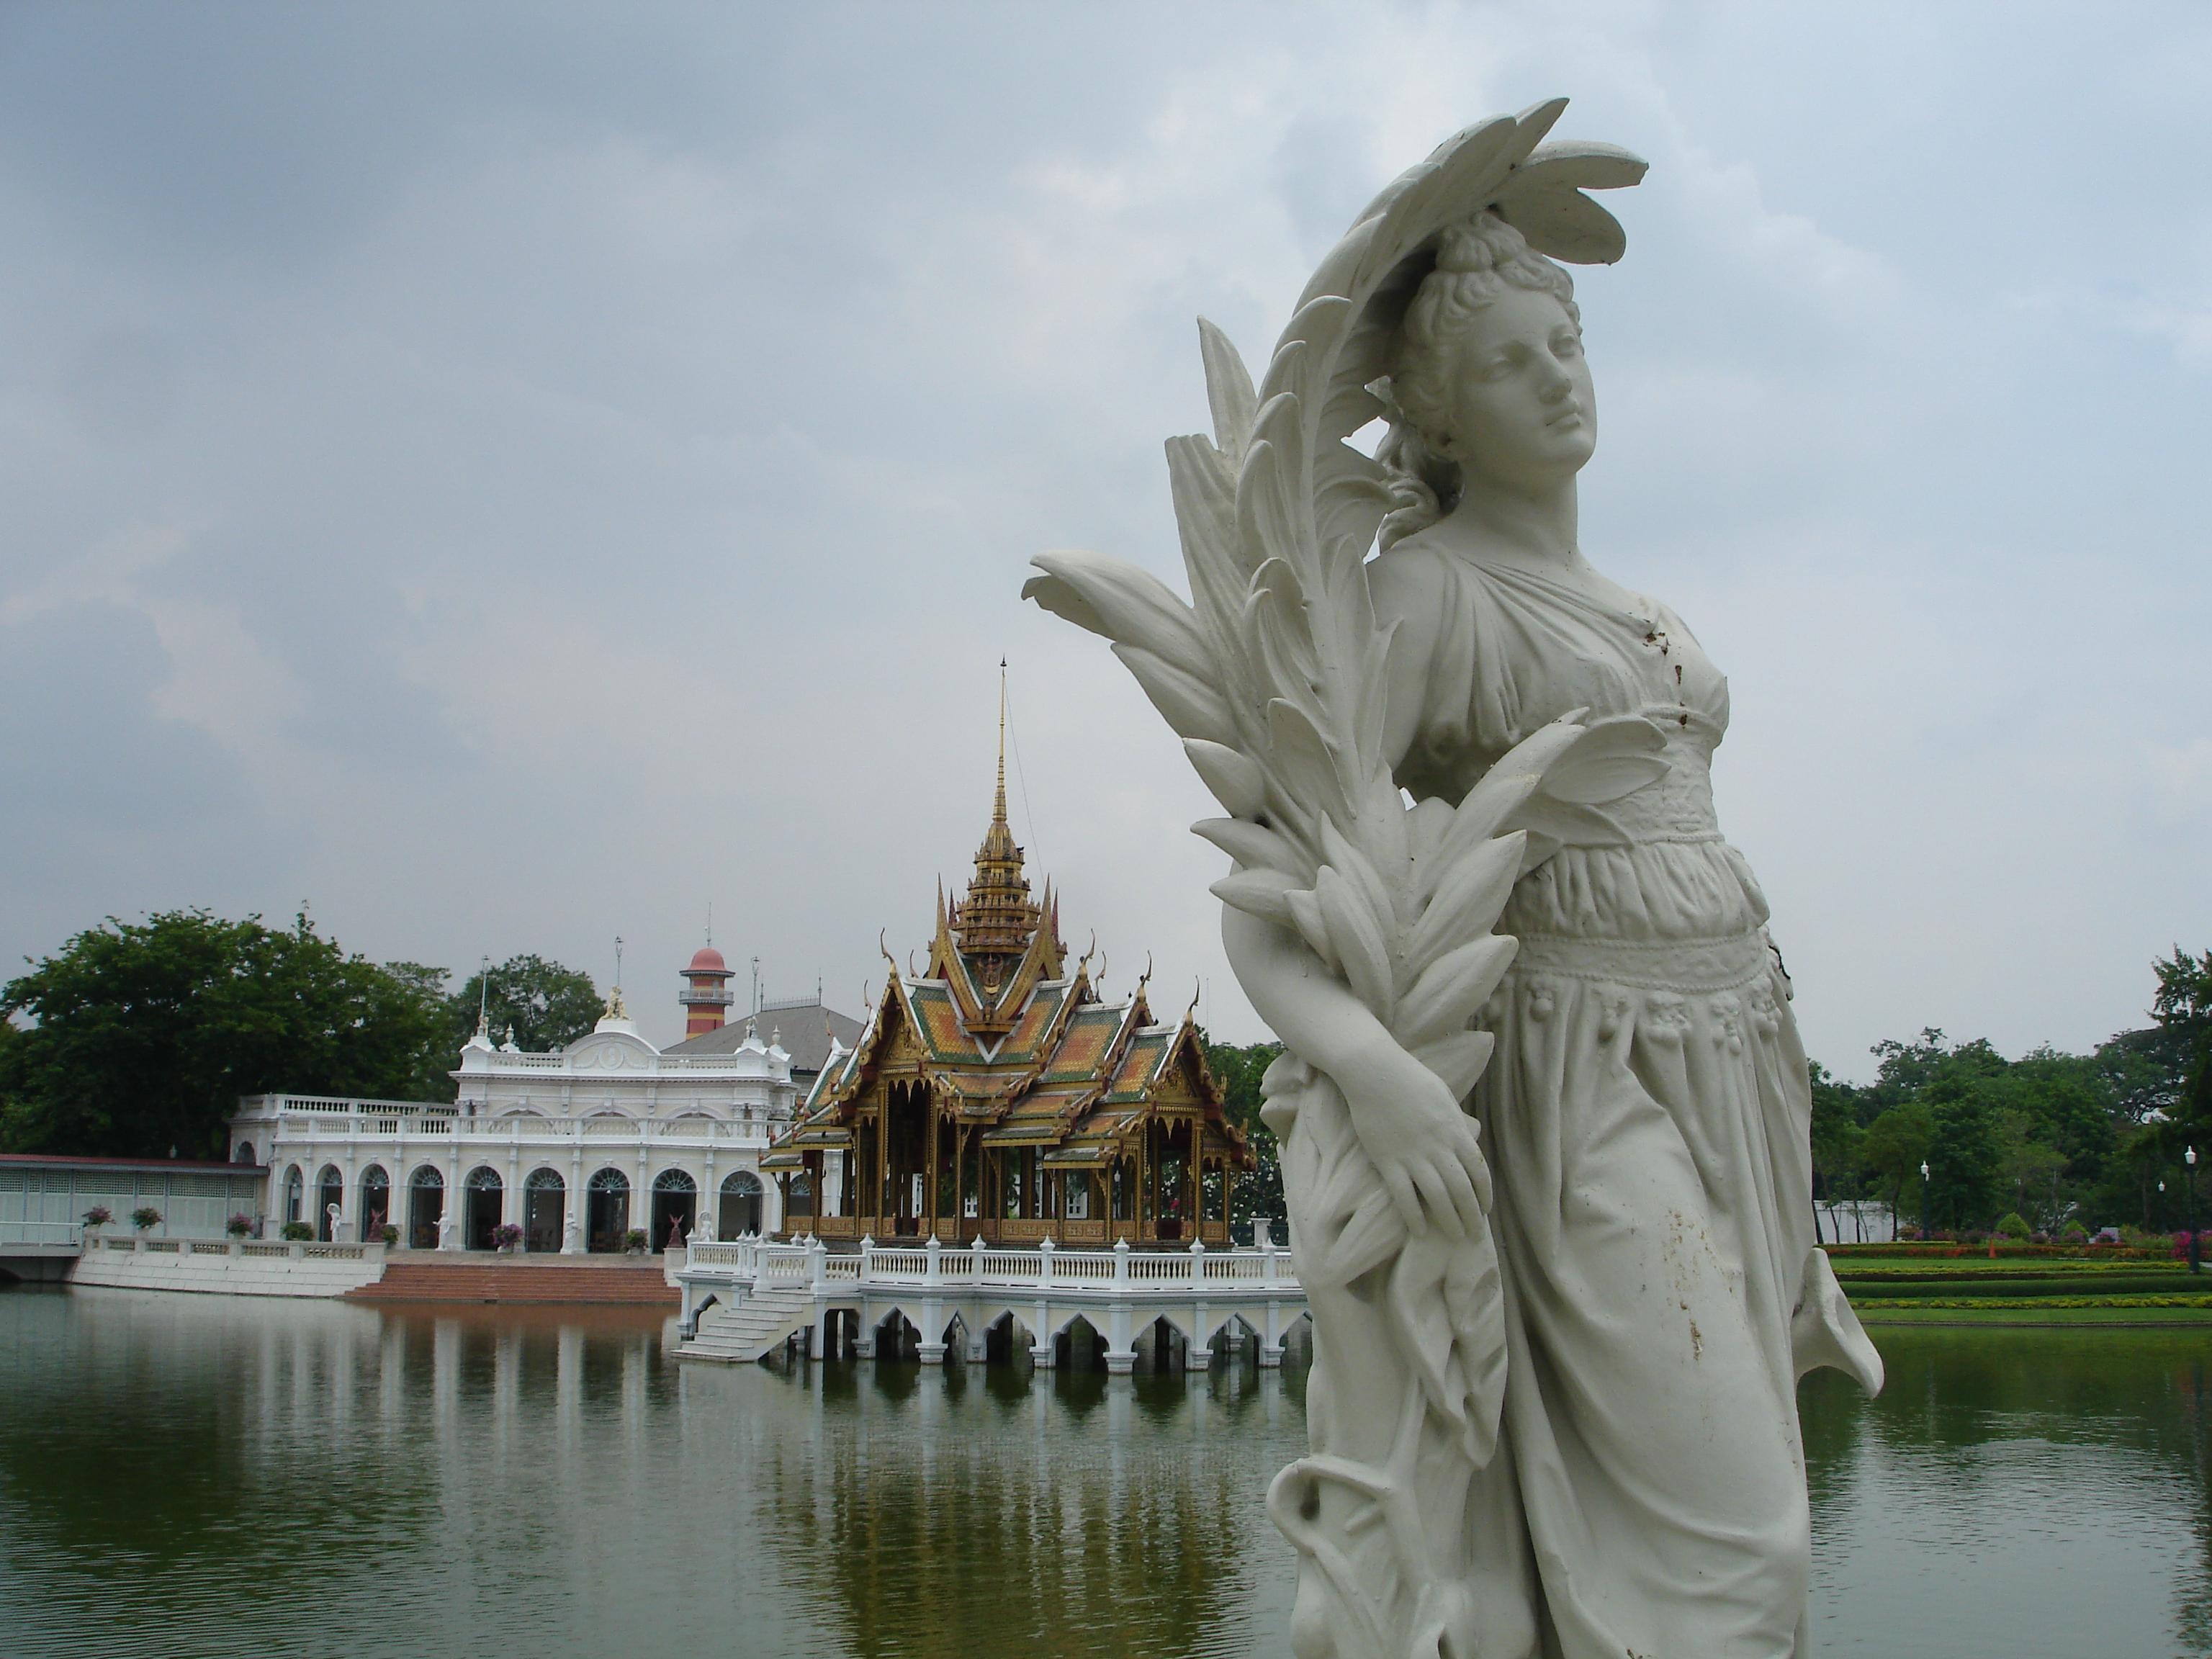 The Outer Palace on Bang Pa-In Island, Bang Pa-In Royal Palace. Photo taken by Mark Jochim on May 16,2006.